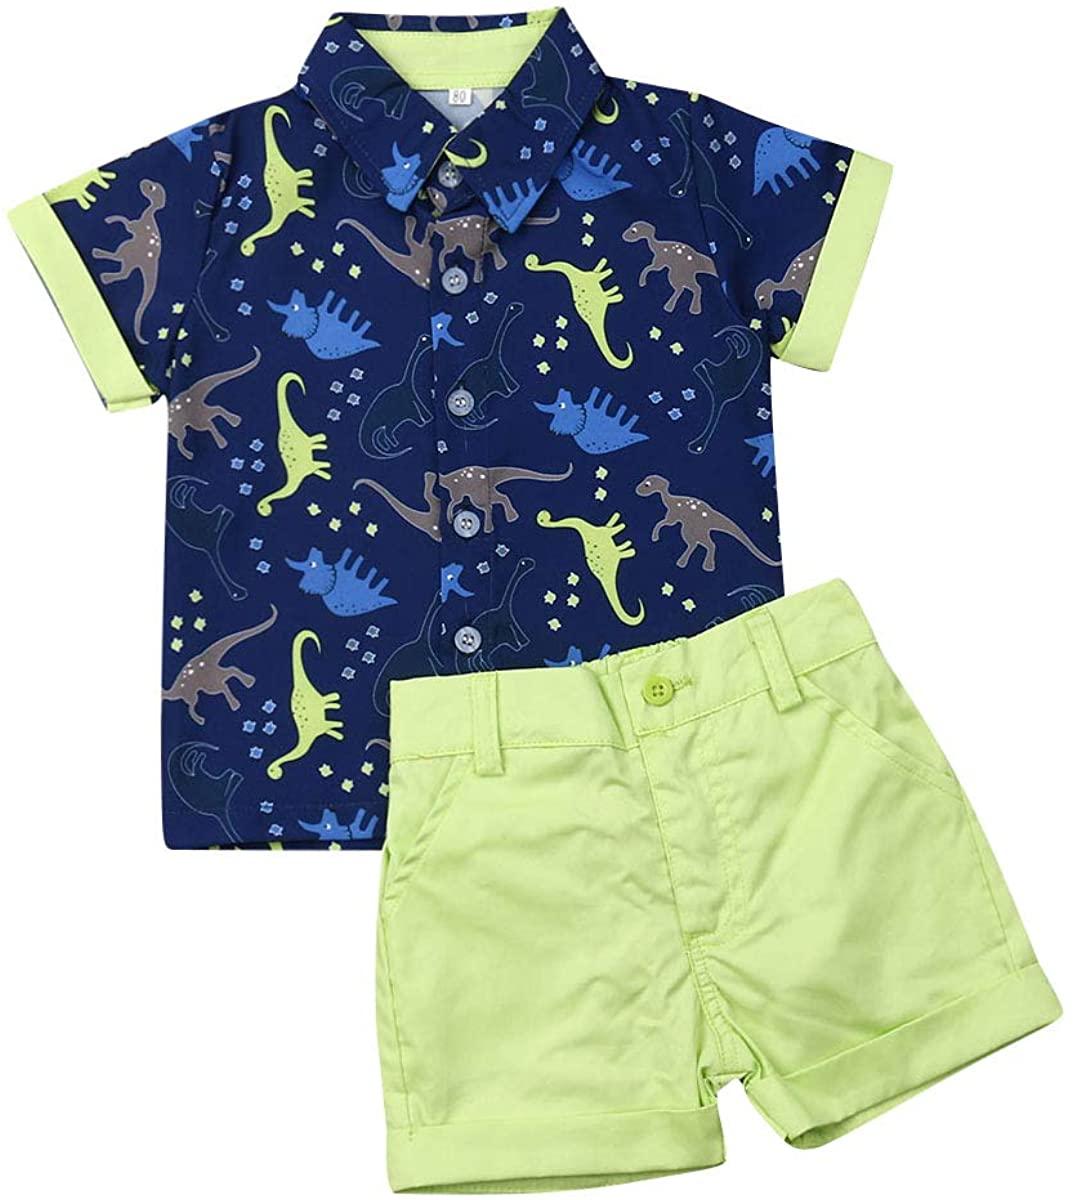 Koloyooya Baby-Boys Baby Boys Gentleman Outfits , Flamingo Print Button Down Shirt+Shorts